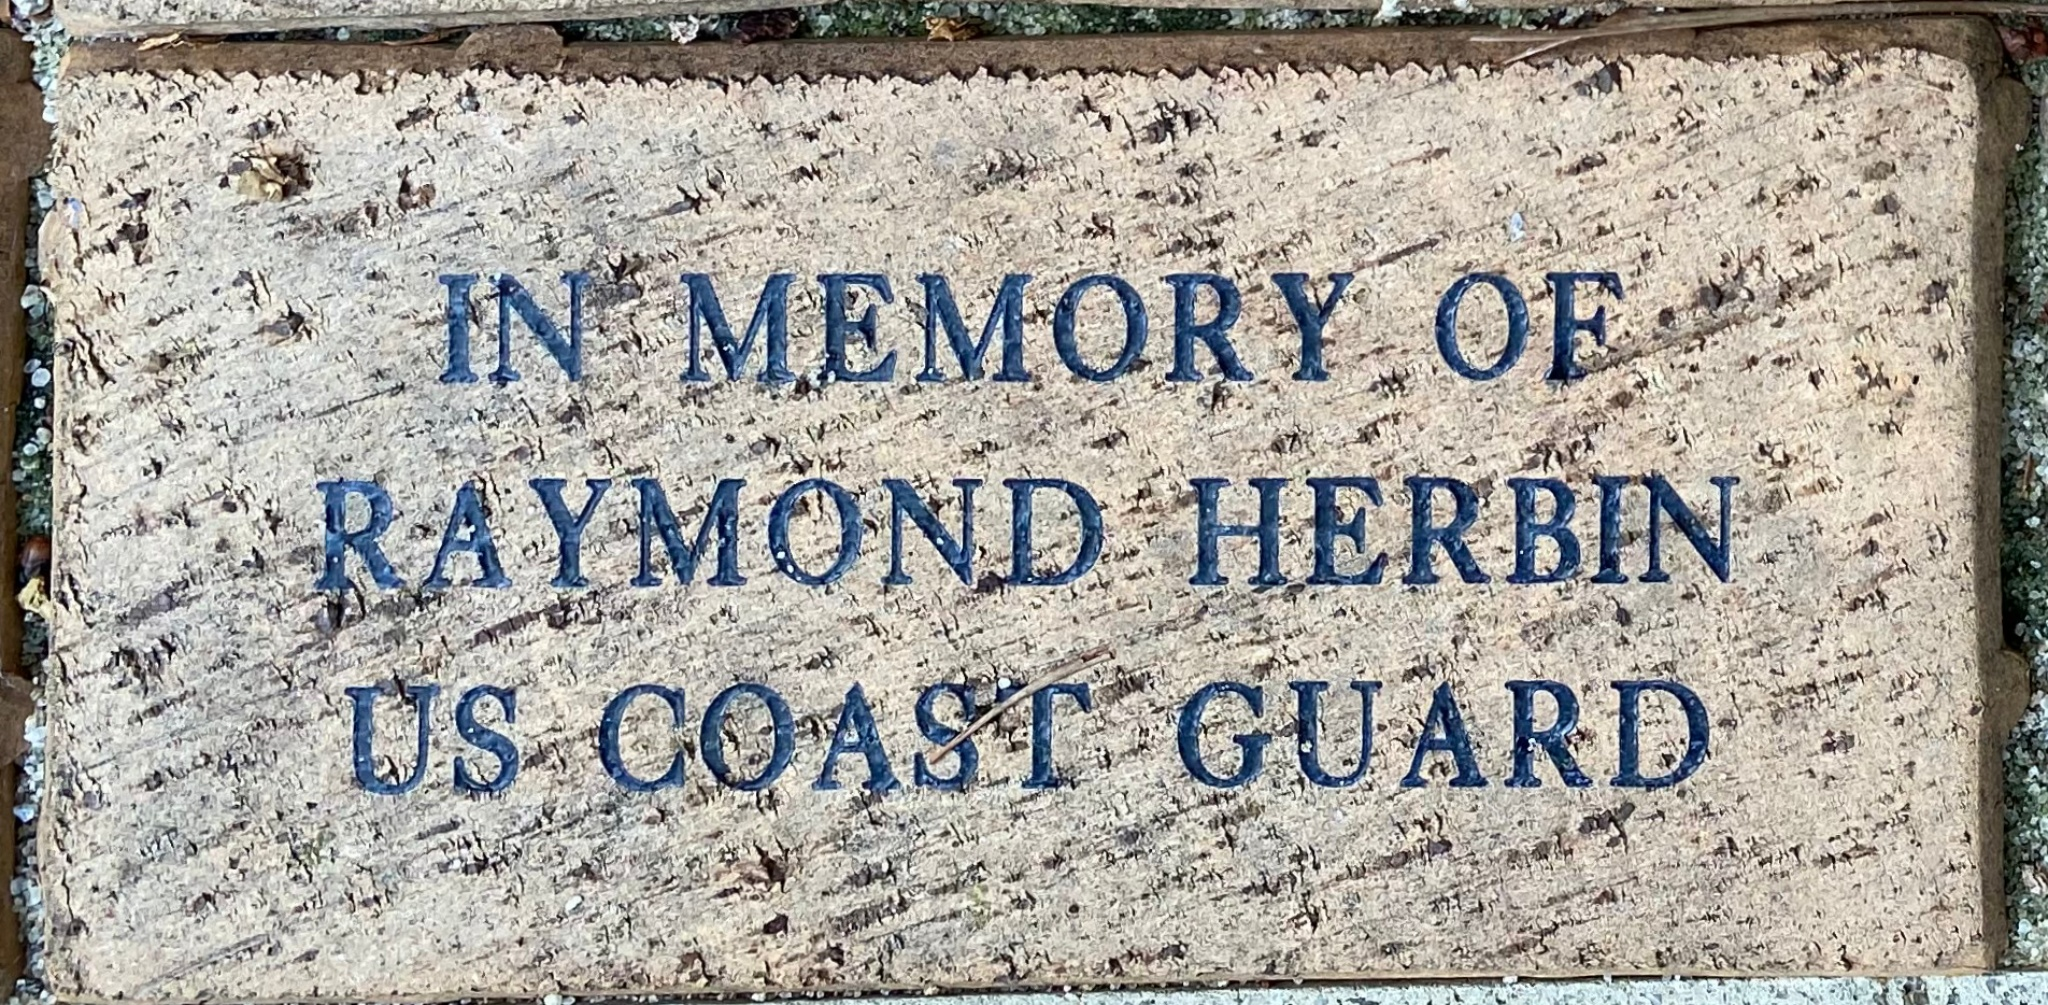 IN MEMORY OF RAYMOND HERBIN US COAST GUARD